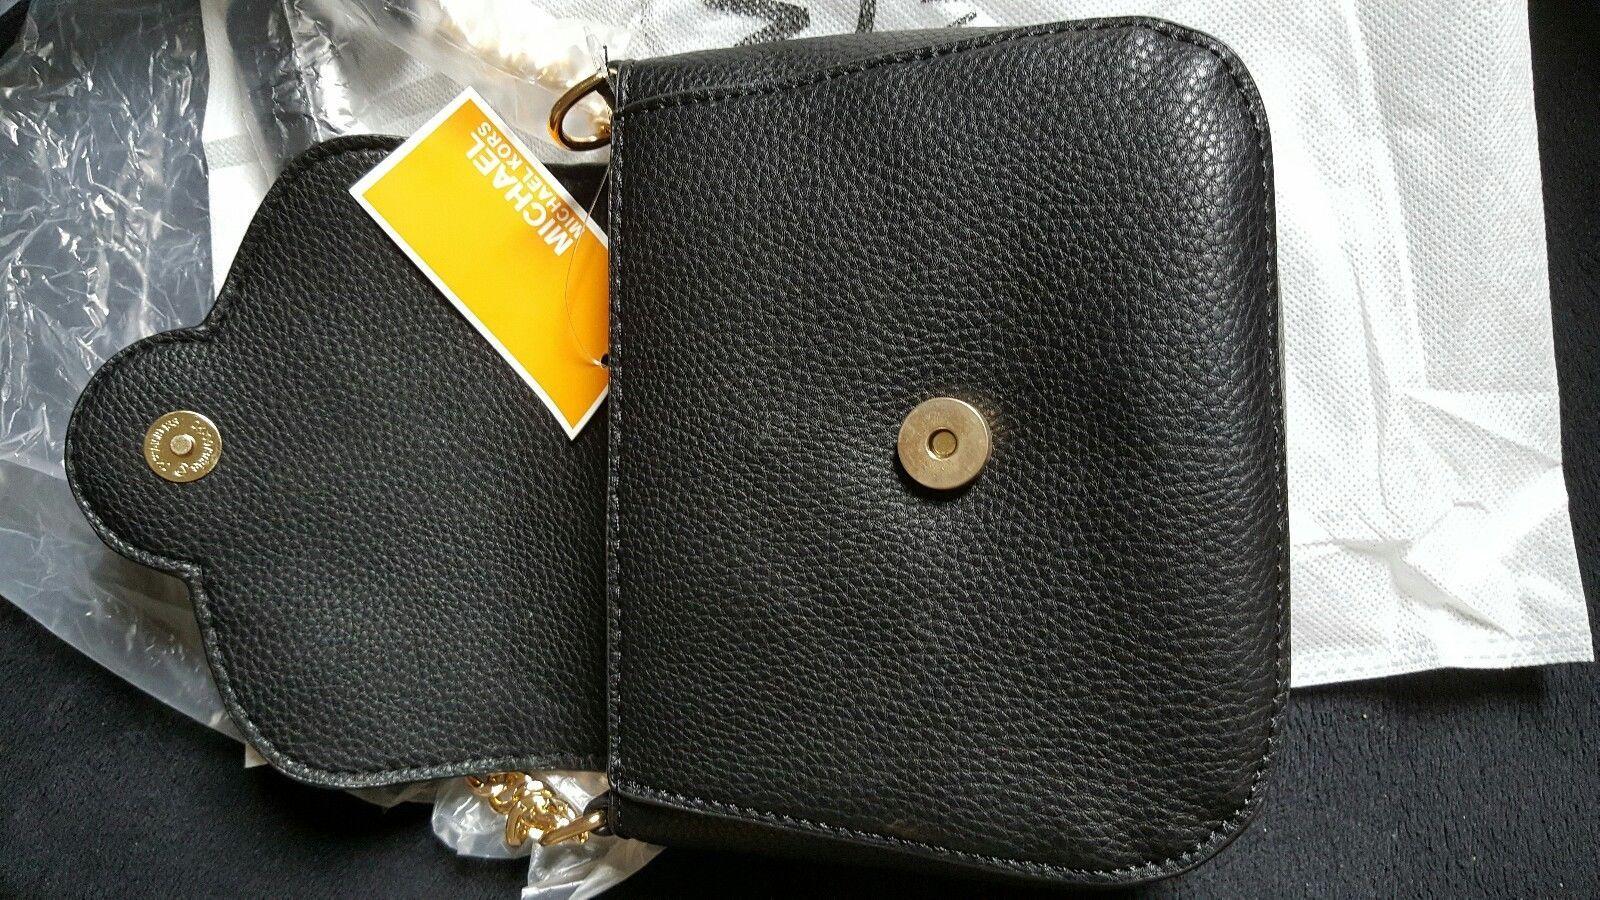 800c588cee0f MICHAEL Kors Black Small Crossbody Bag Purse MK Logo Flap  42.5 ...